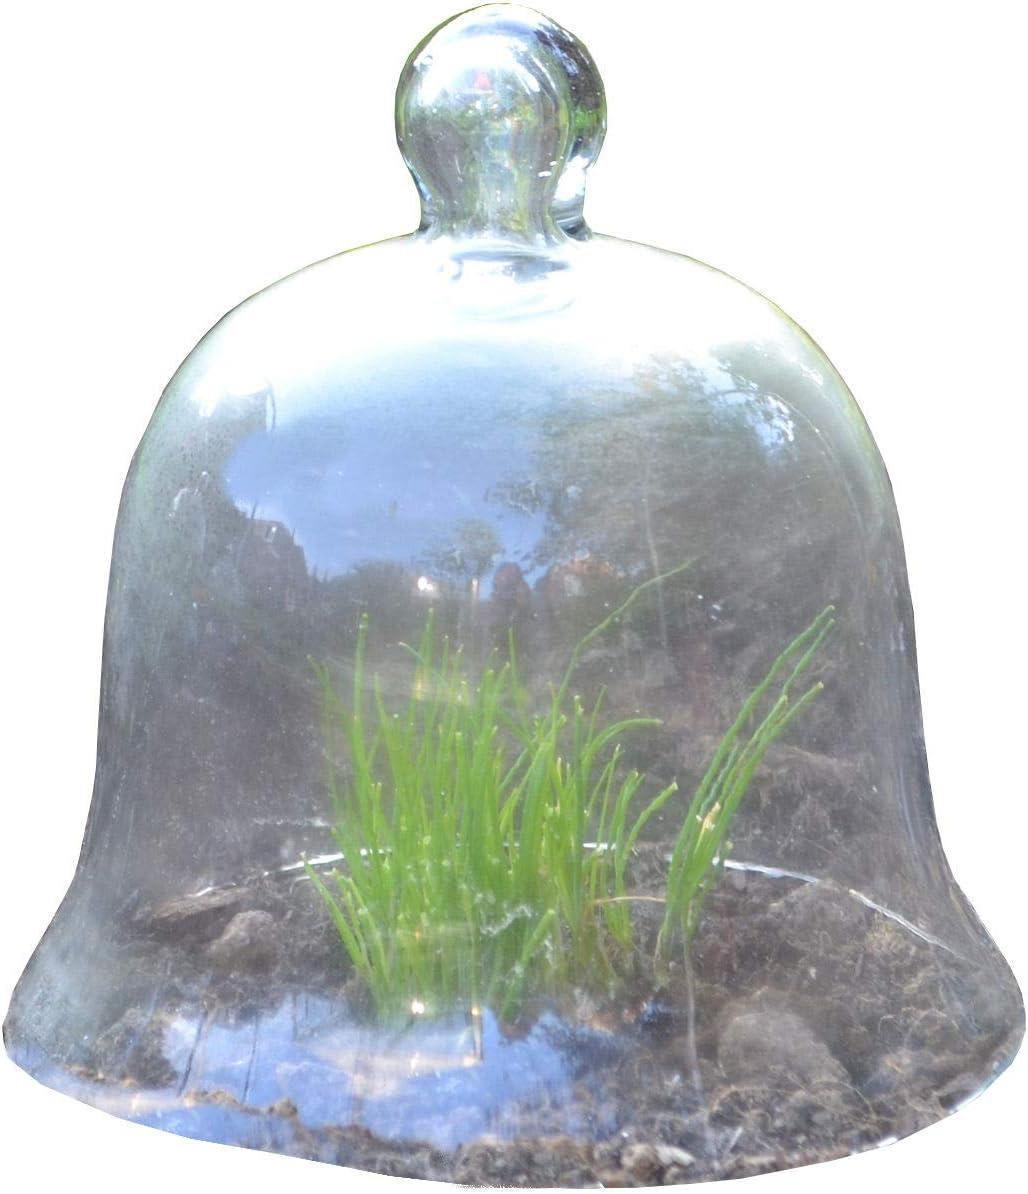 Glasglocke Cloche Glocke aus Glas 20cm